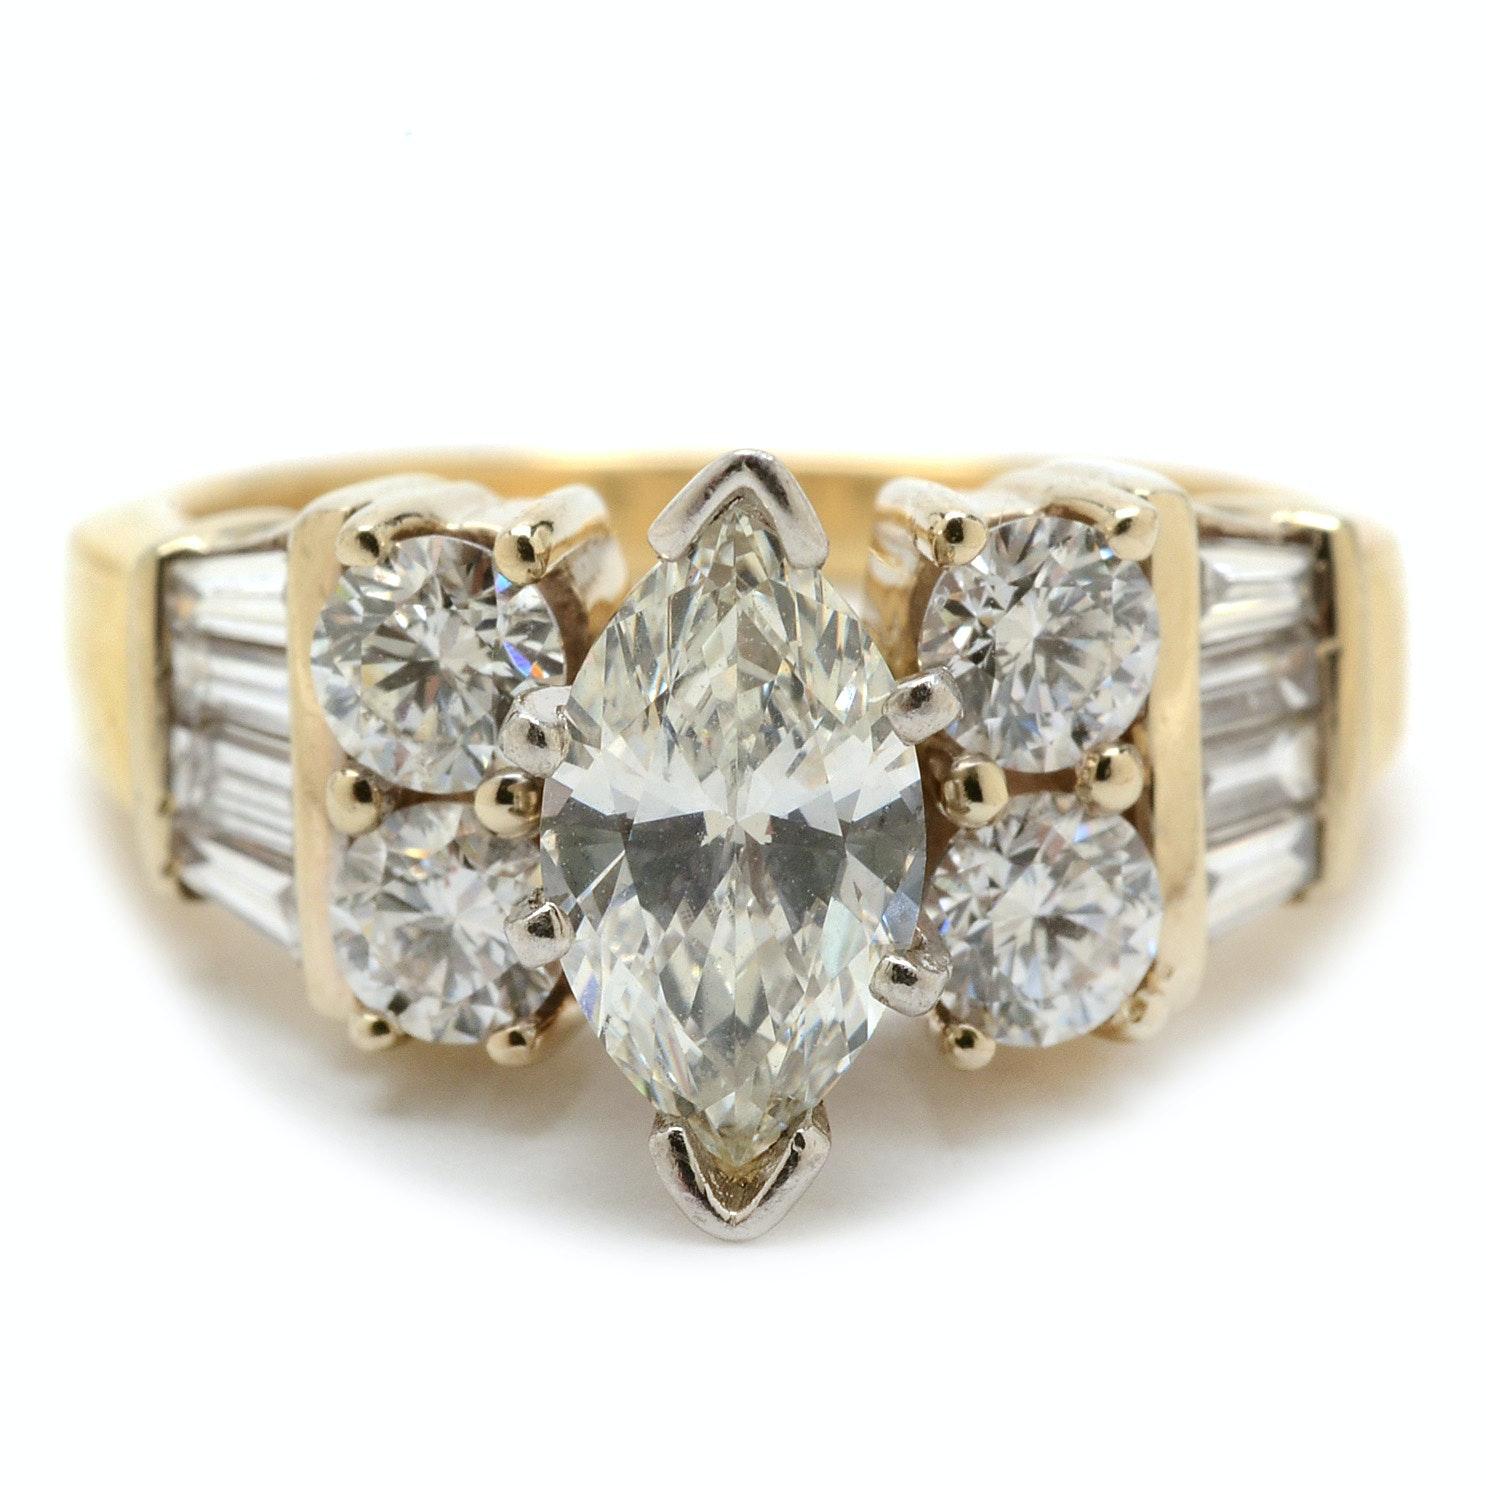 14K Yellow Gold Platinum-Pronged 1.79 CTW Diamond Statement Ring